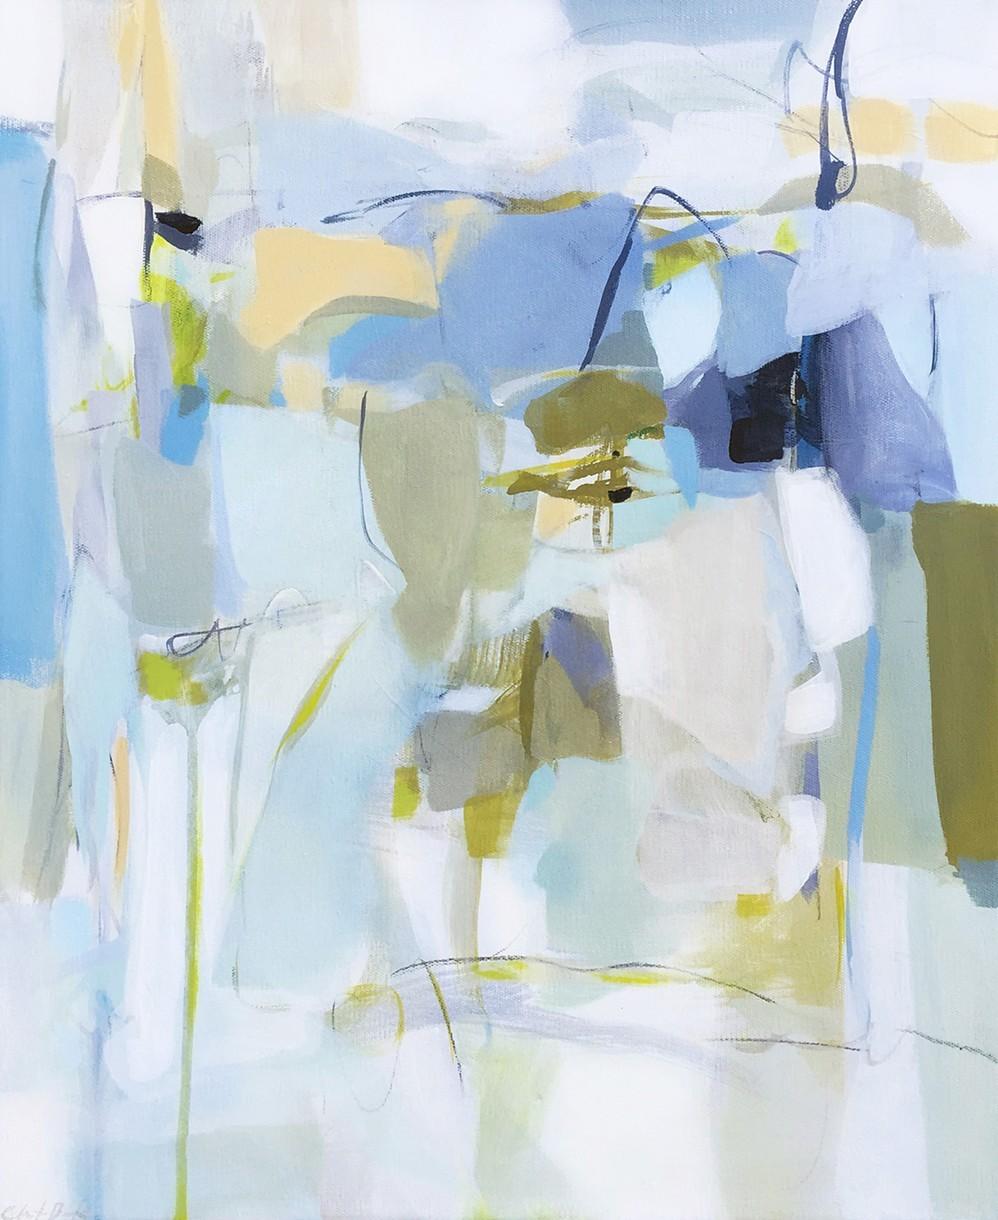 "Christina Baker -  Alexander  - Acrylic on Canvas - 16"" x 20"" - 2015"